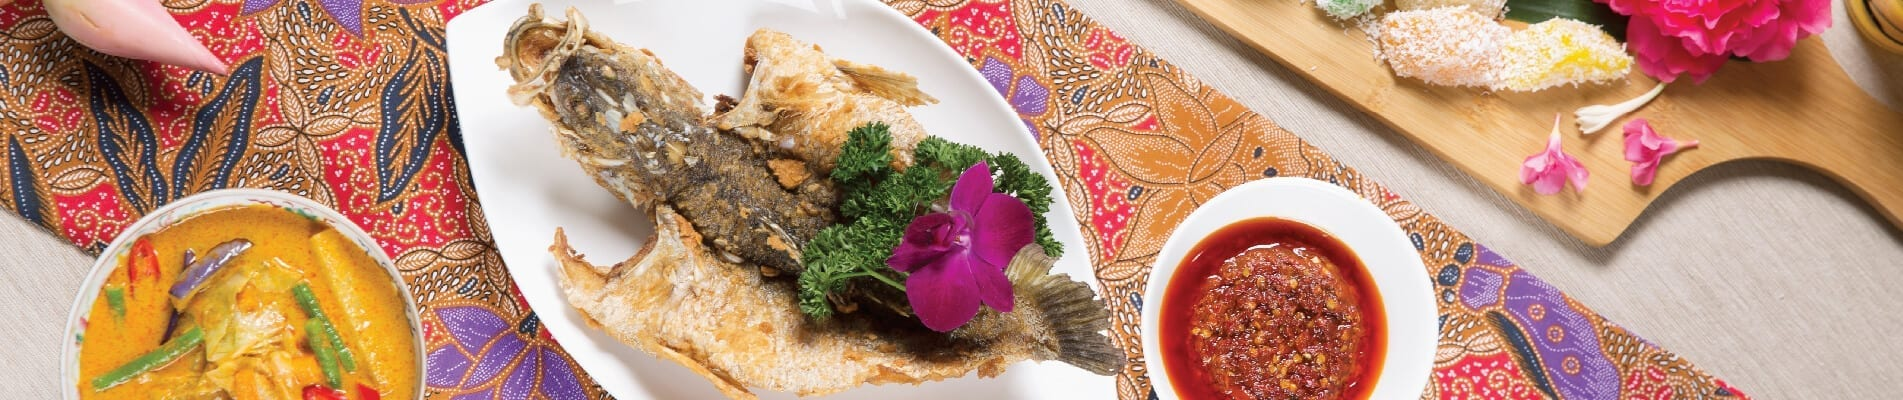 Fish Menu   Chilli Manis Catering